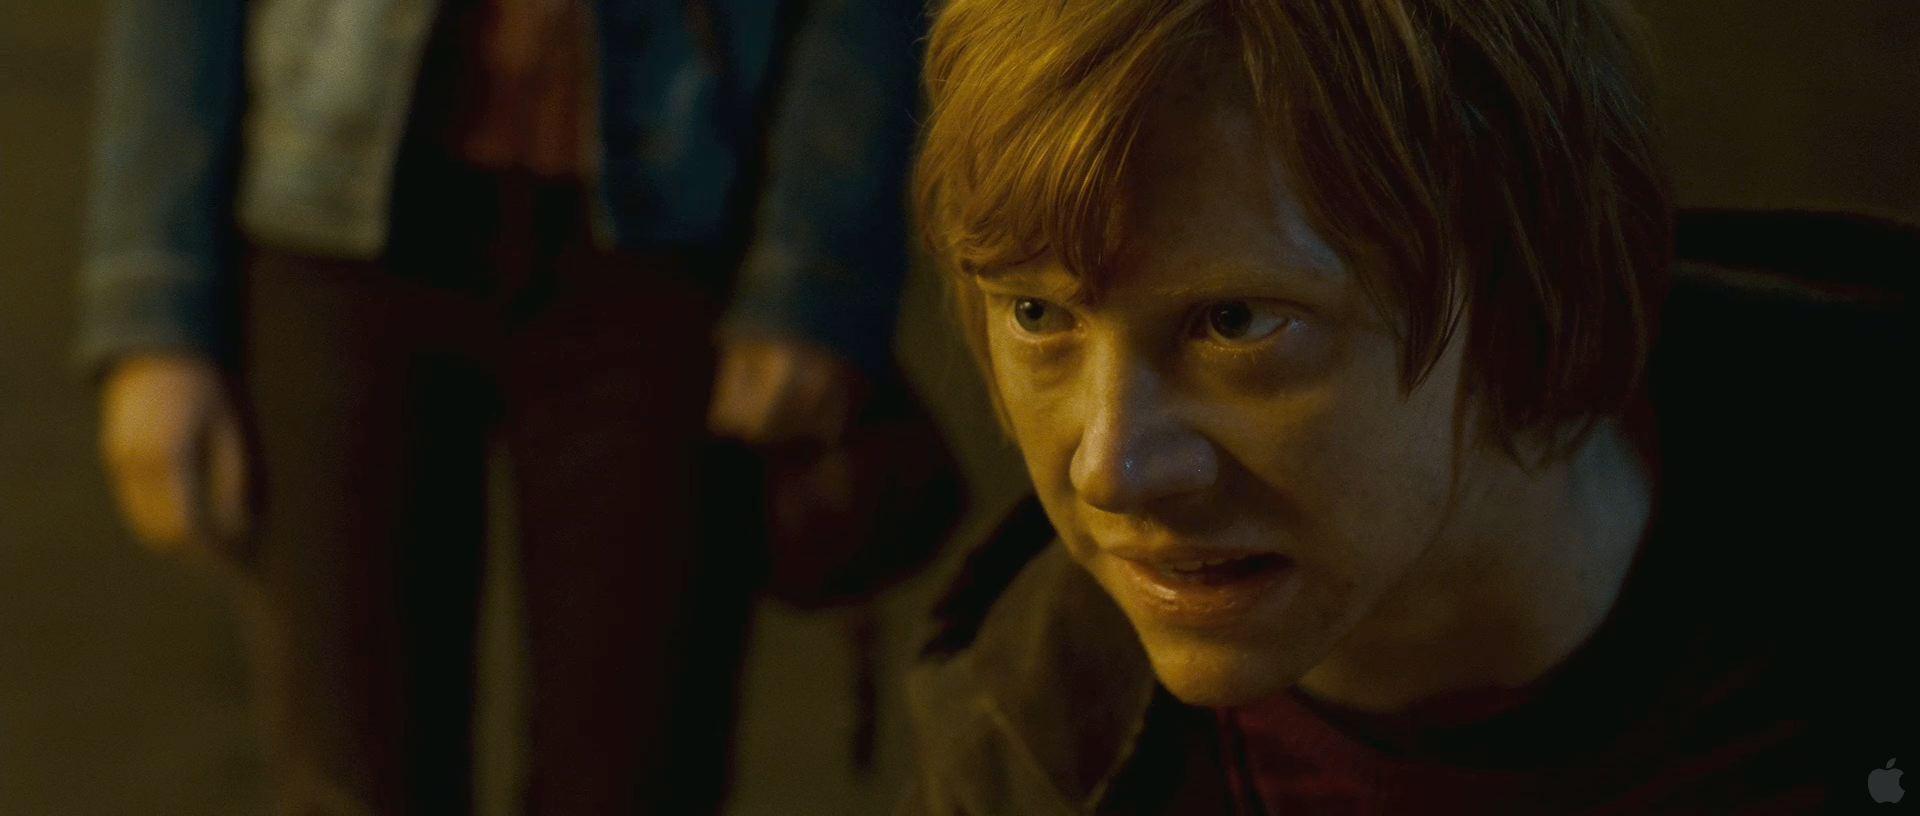 Harry Potter BlogHogwarts HP7 2 Trailer 44